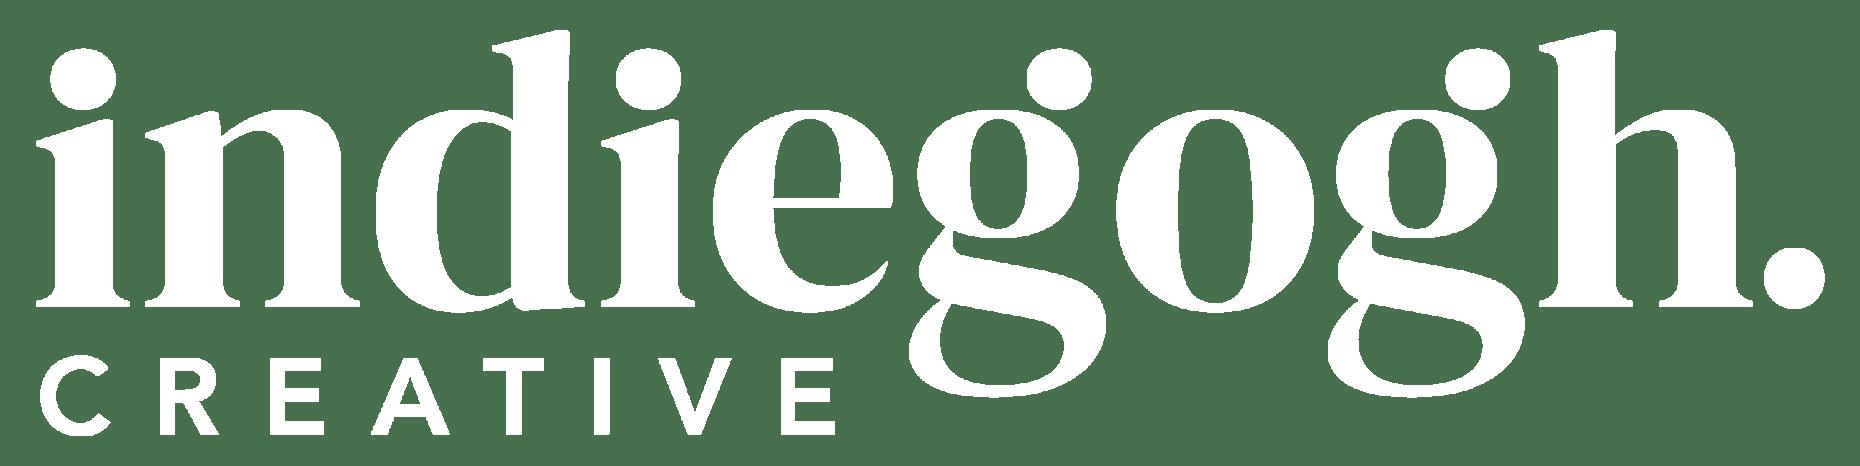 Indiegogh Creative | Austin Branding Studio